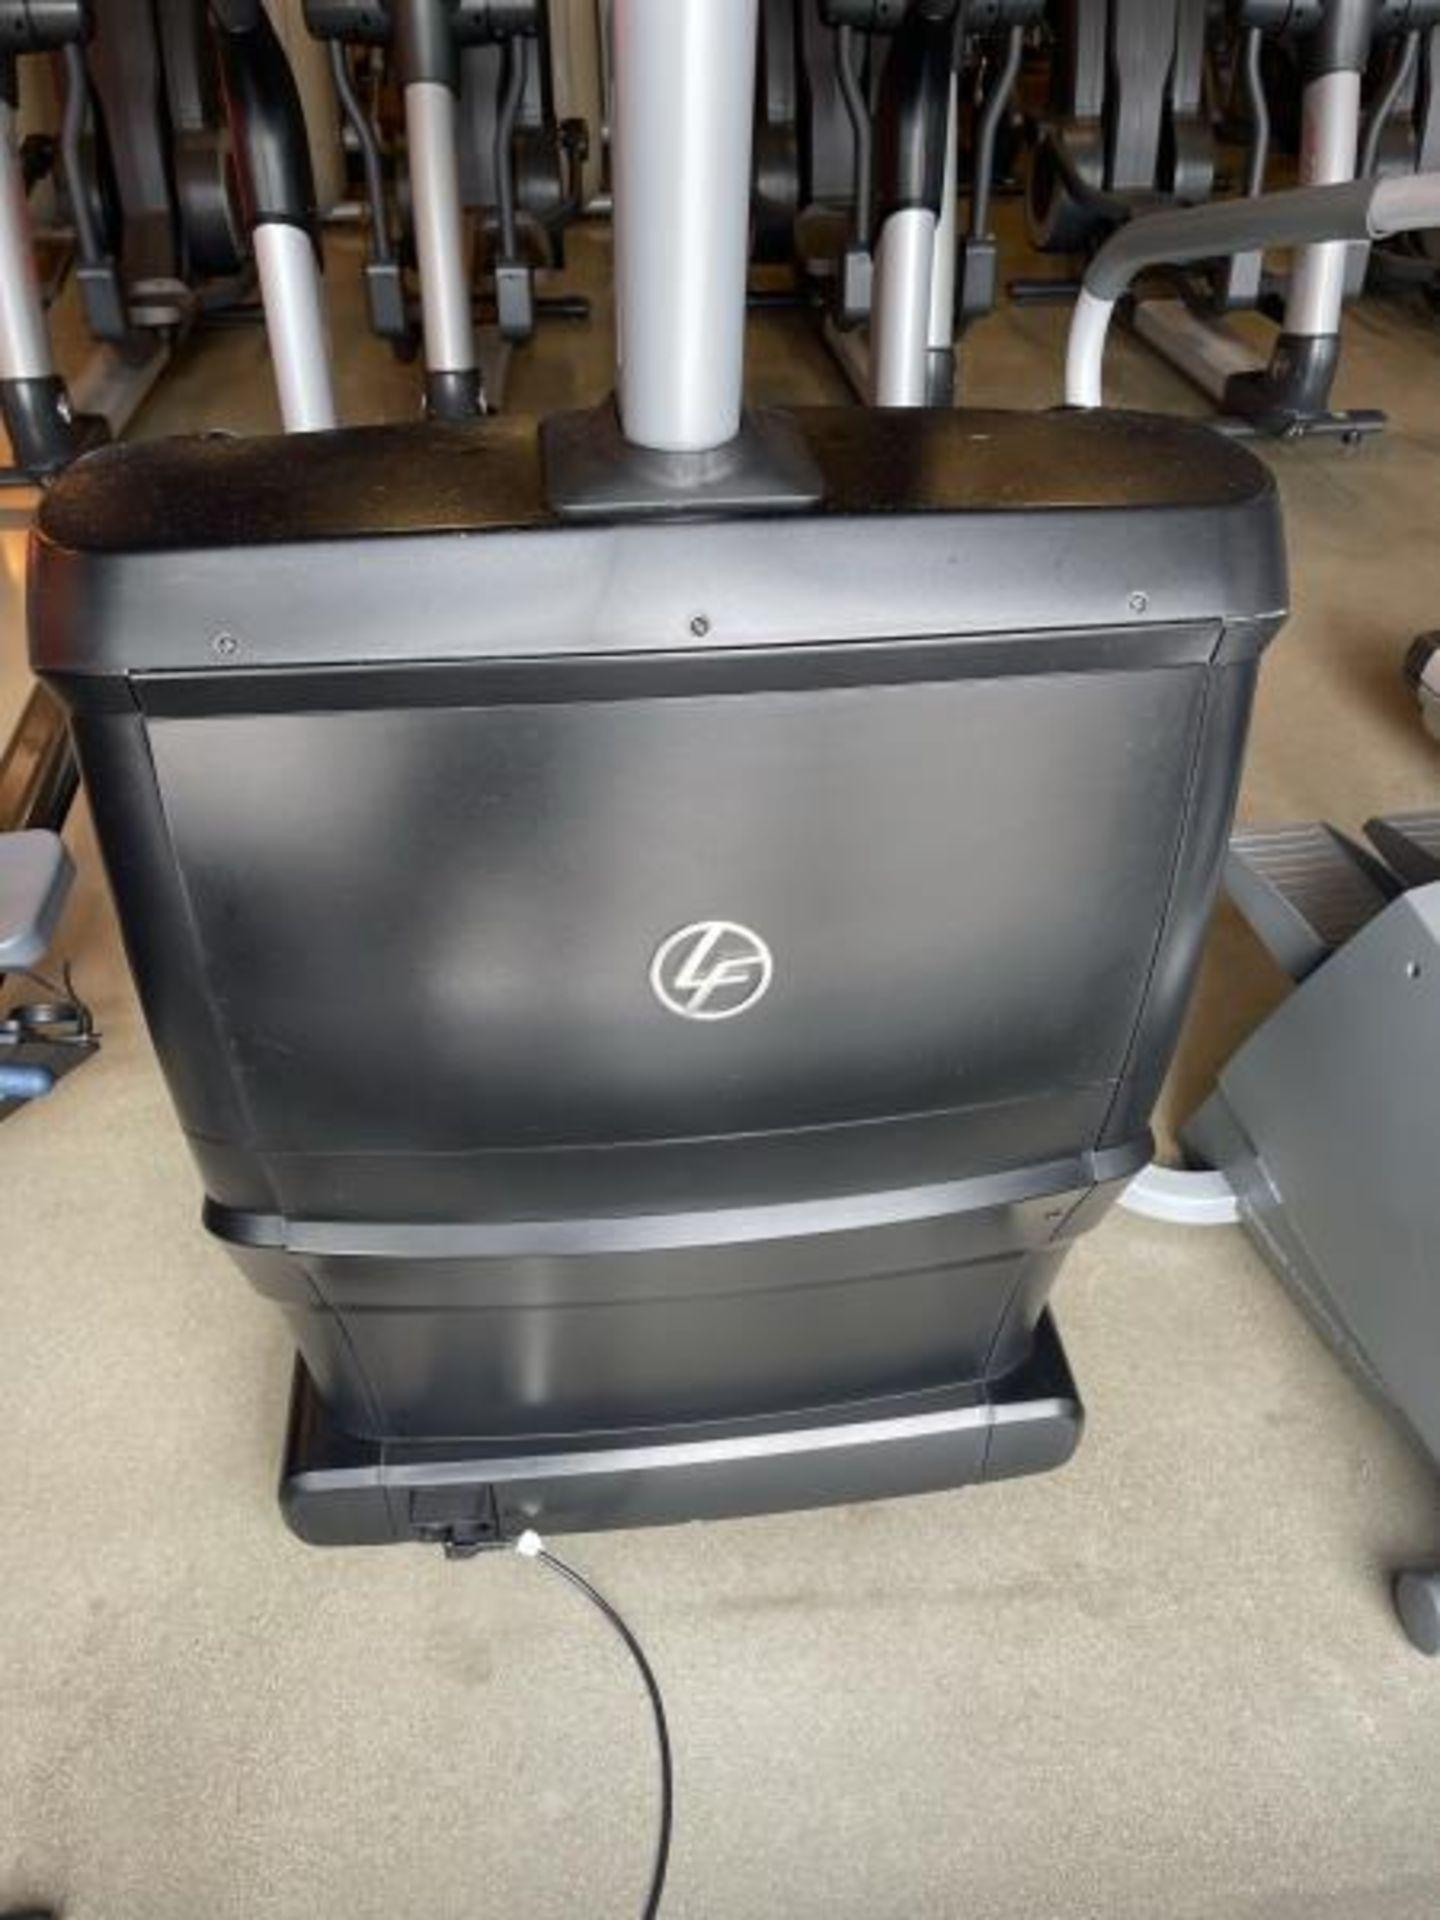 Life Fitness Powermill SN: PMH103963 - Image 4 of 7